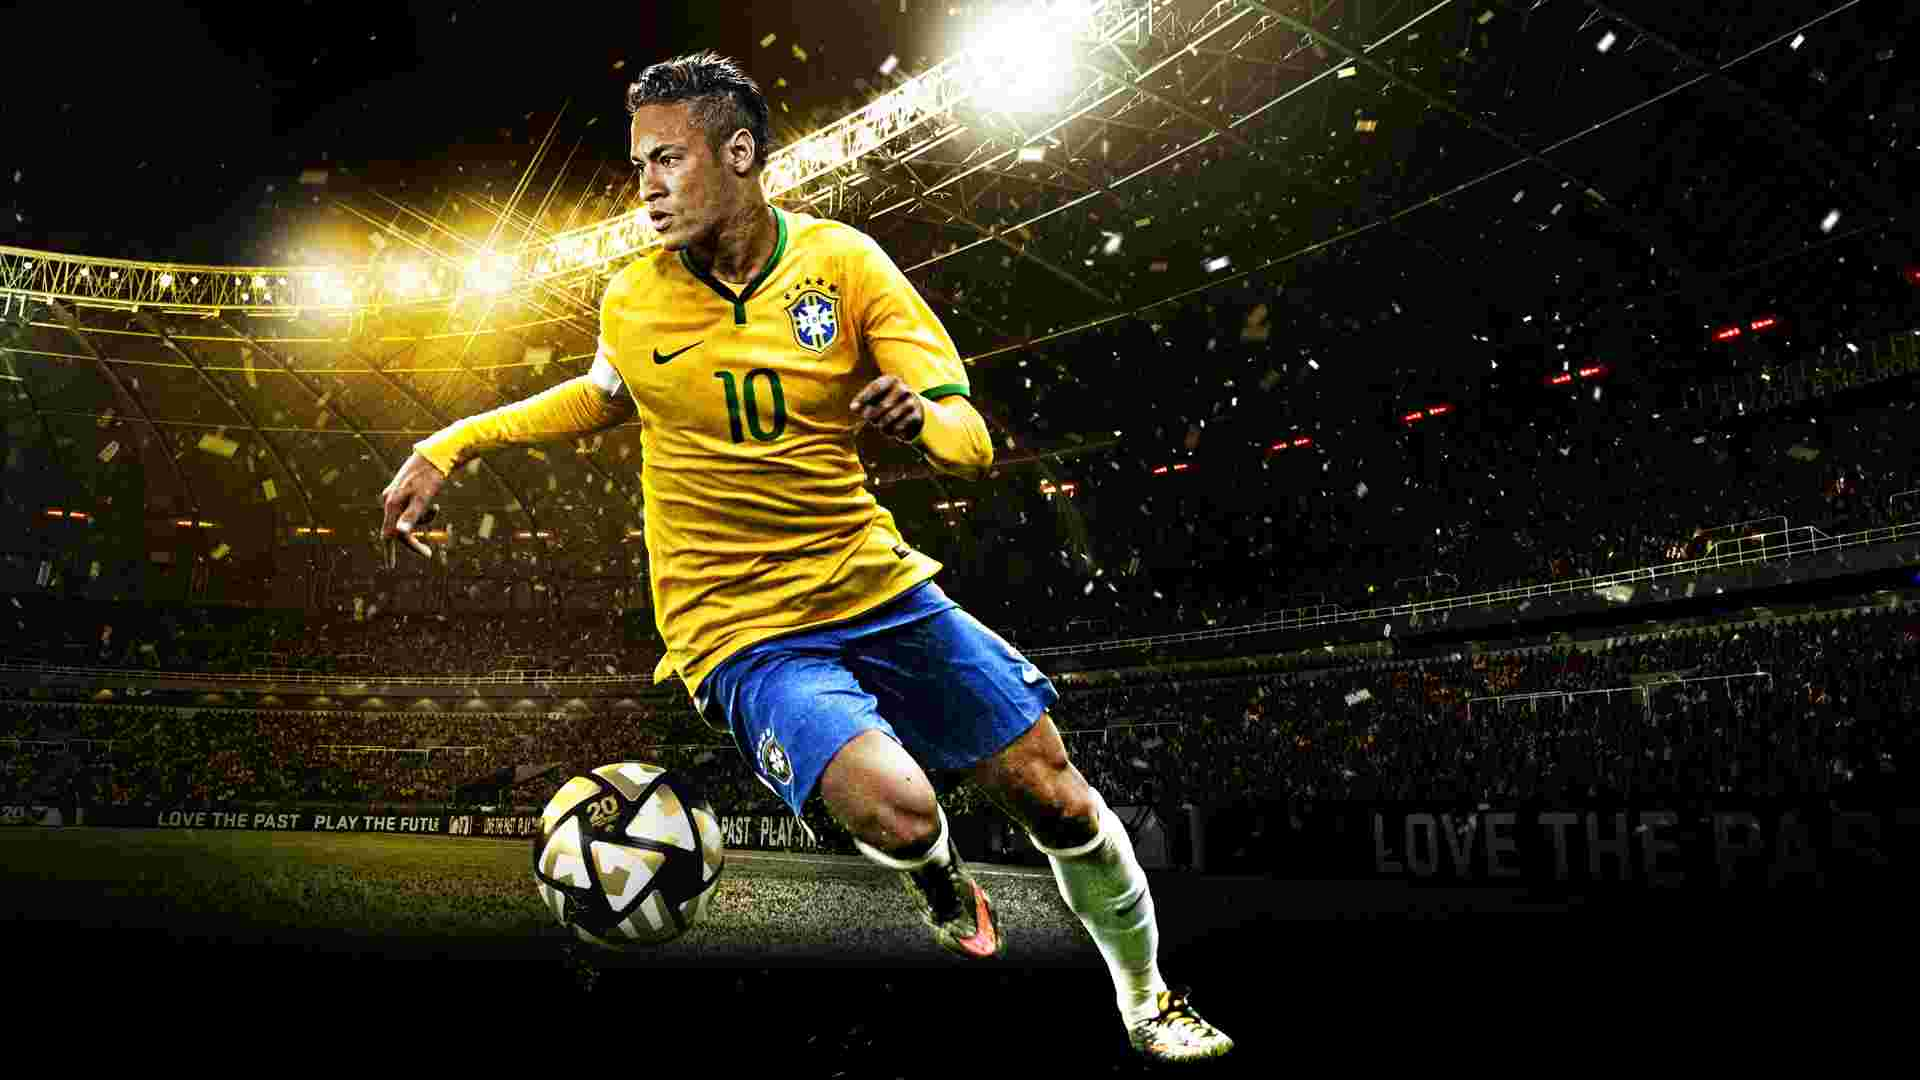 Огляд Pro Evolution Soccer 2016   Огляд PES 2016